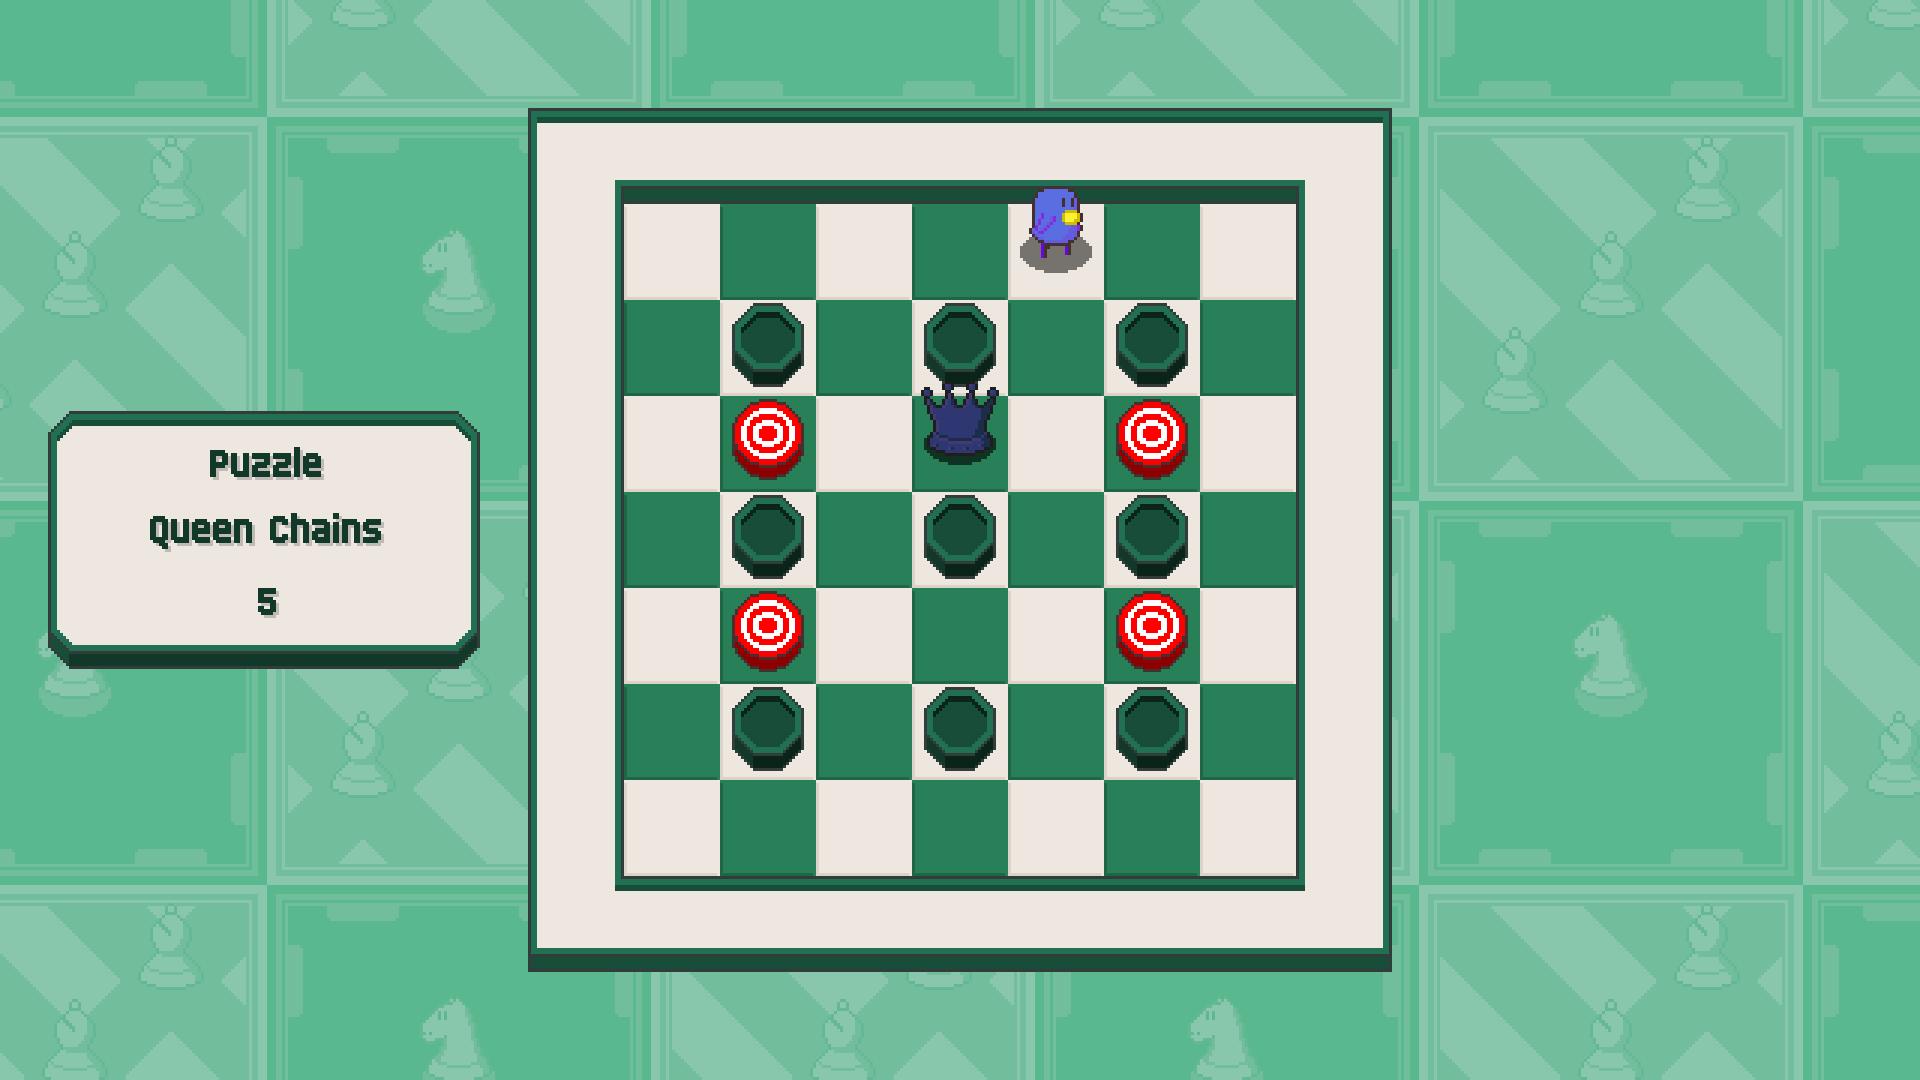 Chessplosion - Puzzle Solution Guide + Achievements Walkthrough - Beginner: Queen Chains - EC2387D